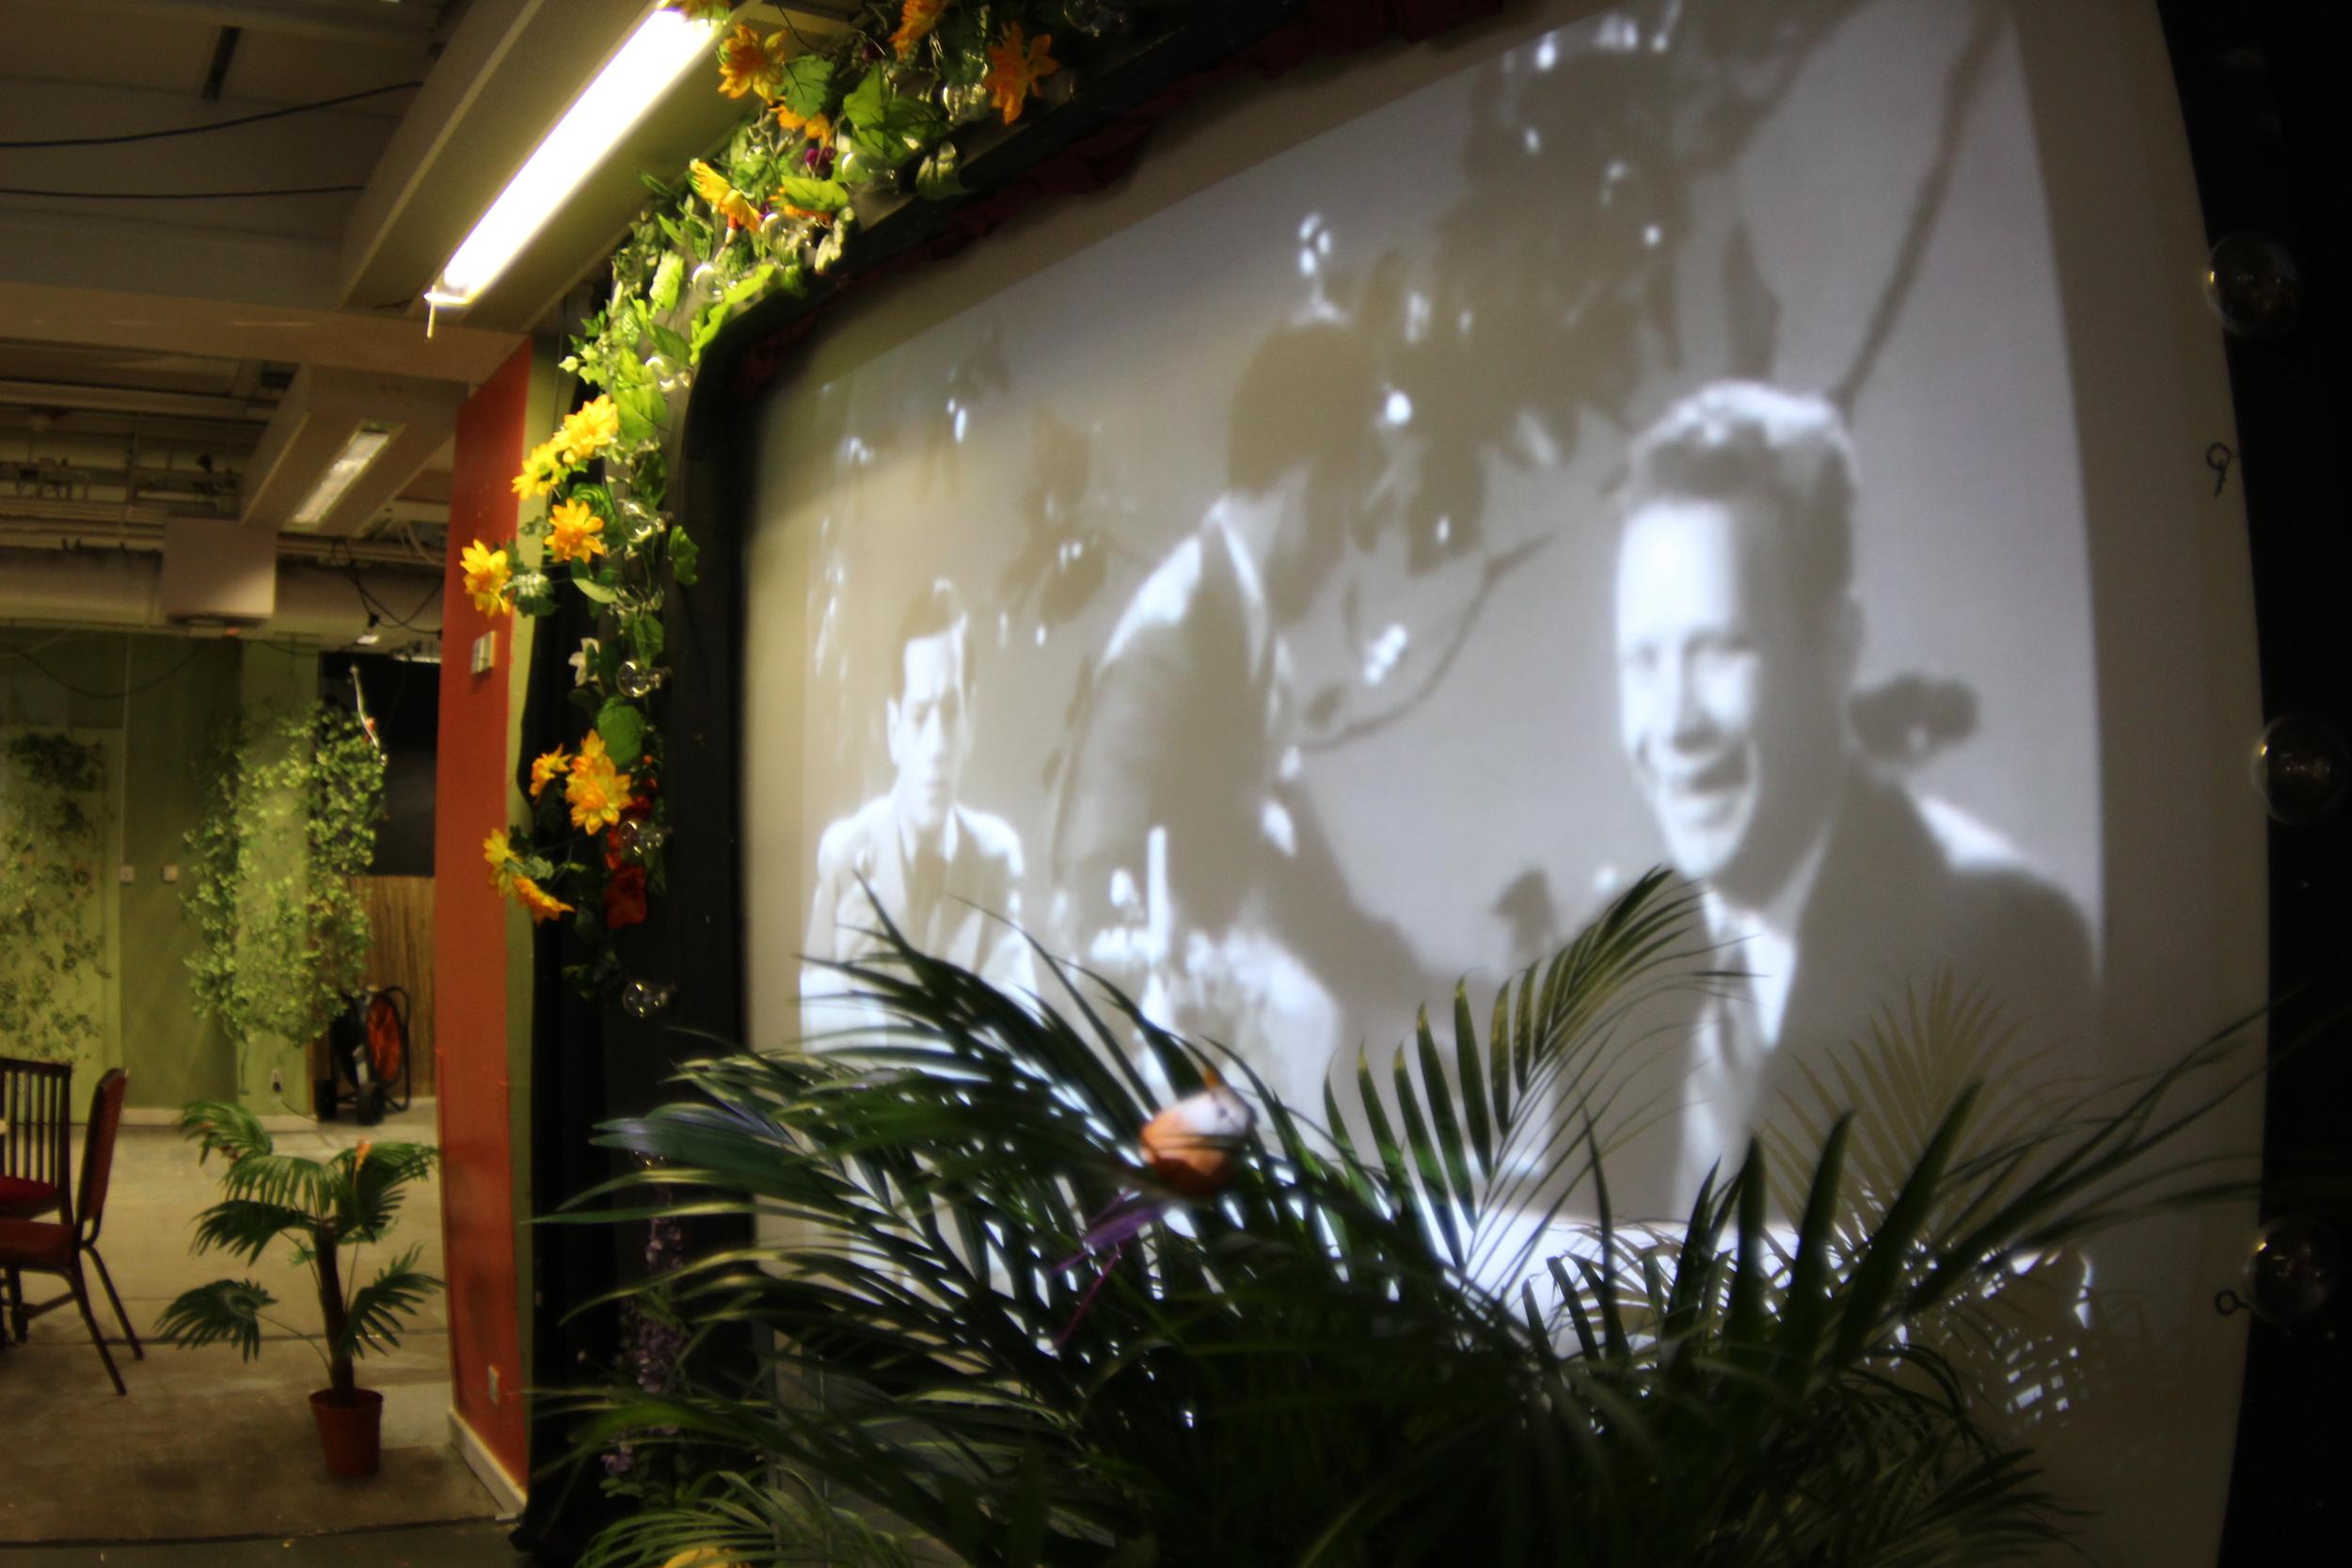 Carioca Video Projection Design